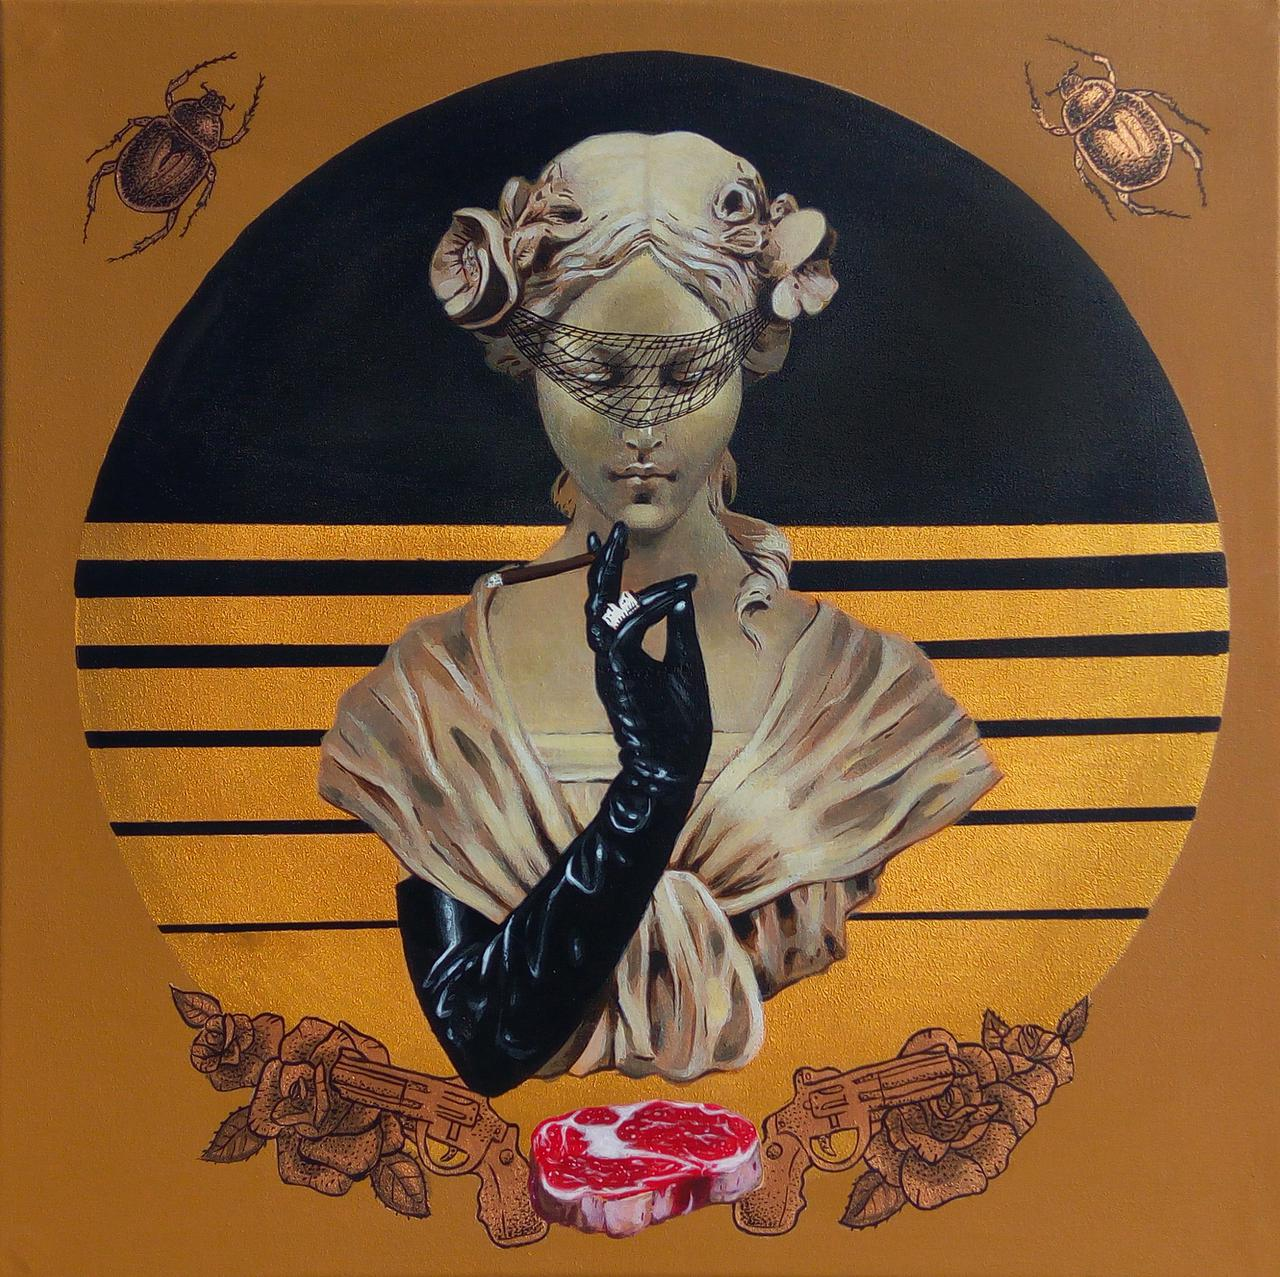 The Widow, acrylic on canvas, 50 x 50 cm